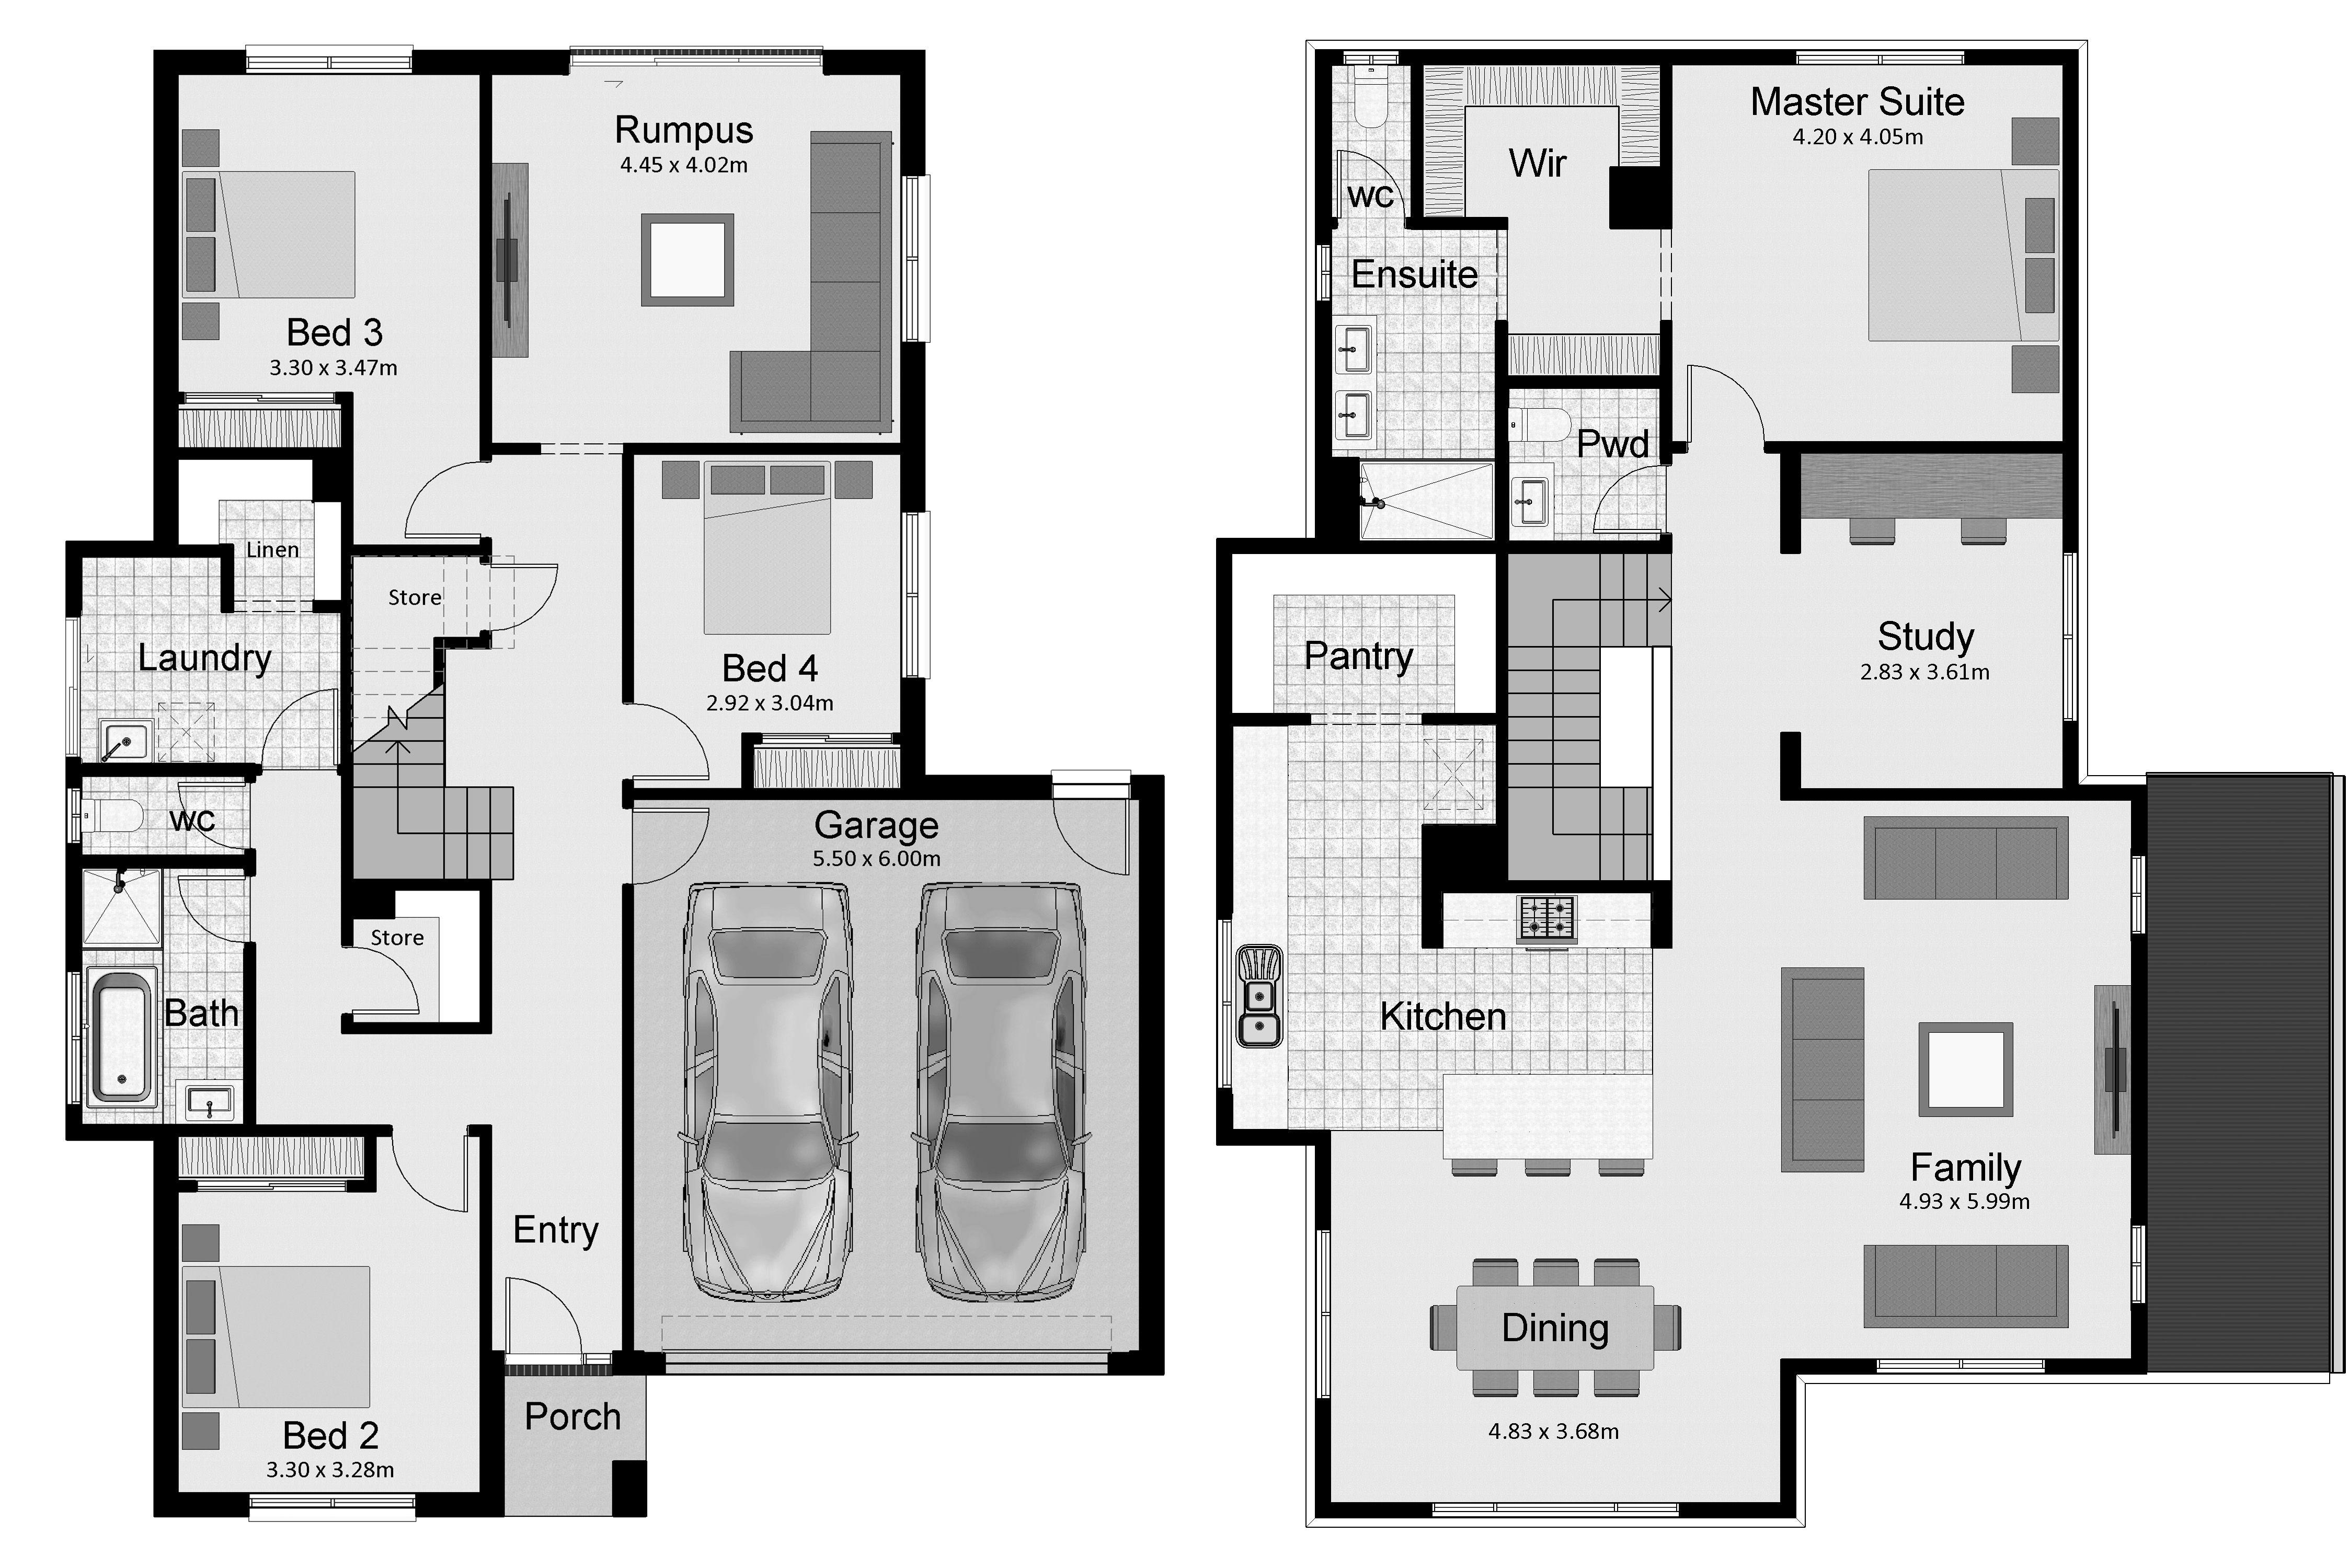 The esplanade hotondo homes house plans australia upside down storey also best reverse living images floor plan design rh pinterest